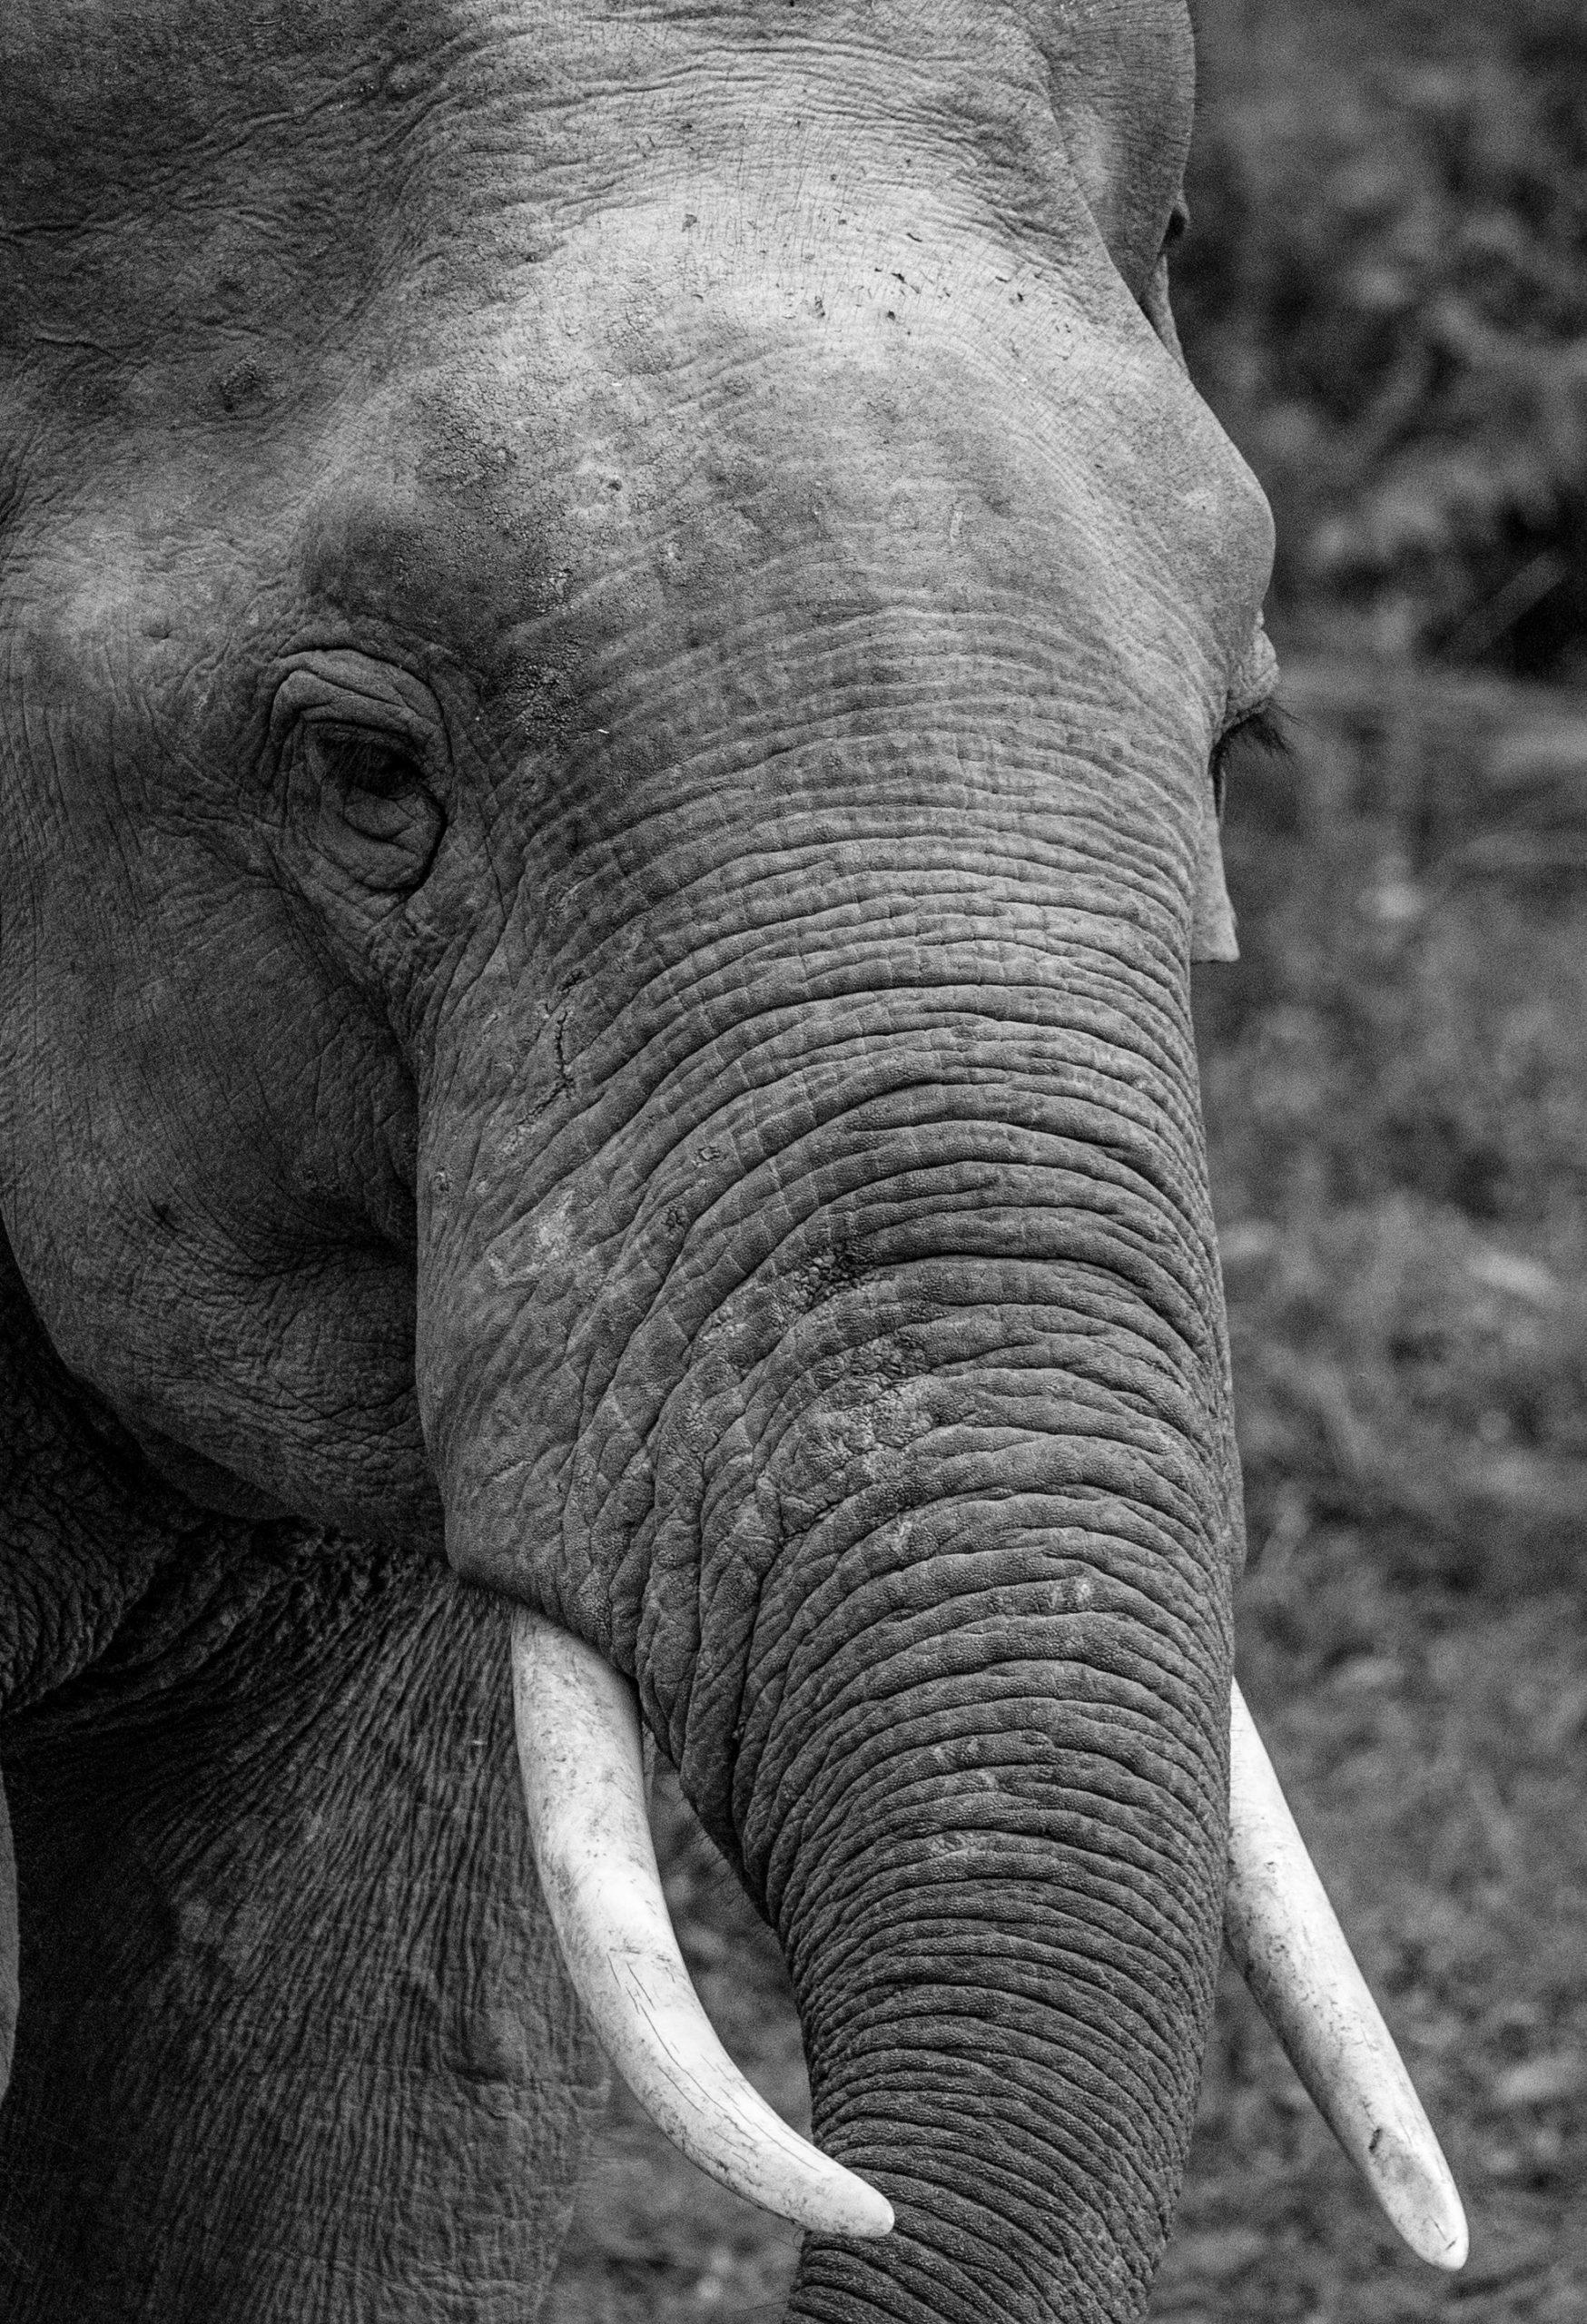 thaialnde_elephant_asie_trompe_tête_défenses